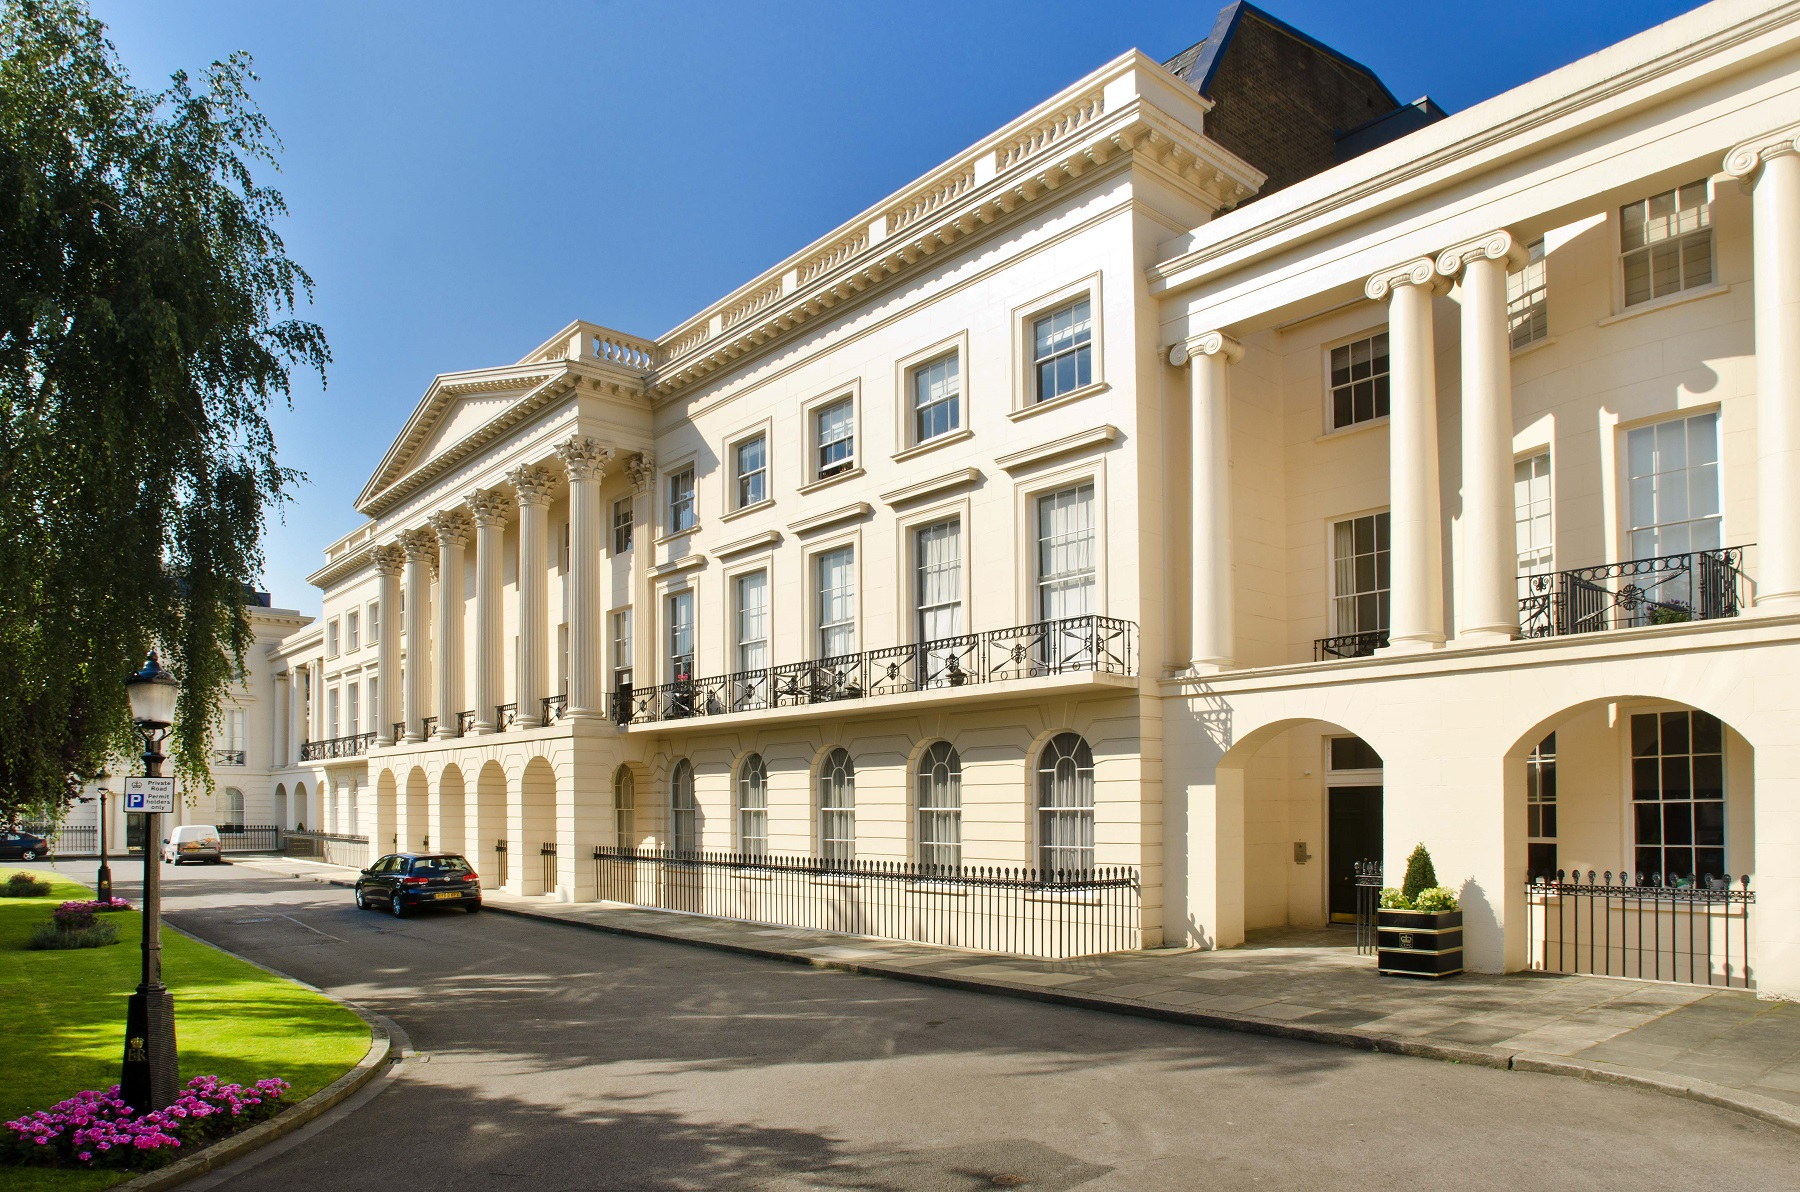 Apartamento para Venda às Clarence Terrace London, Inglaterra NW14RD Reino Unido